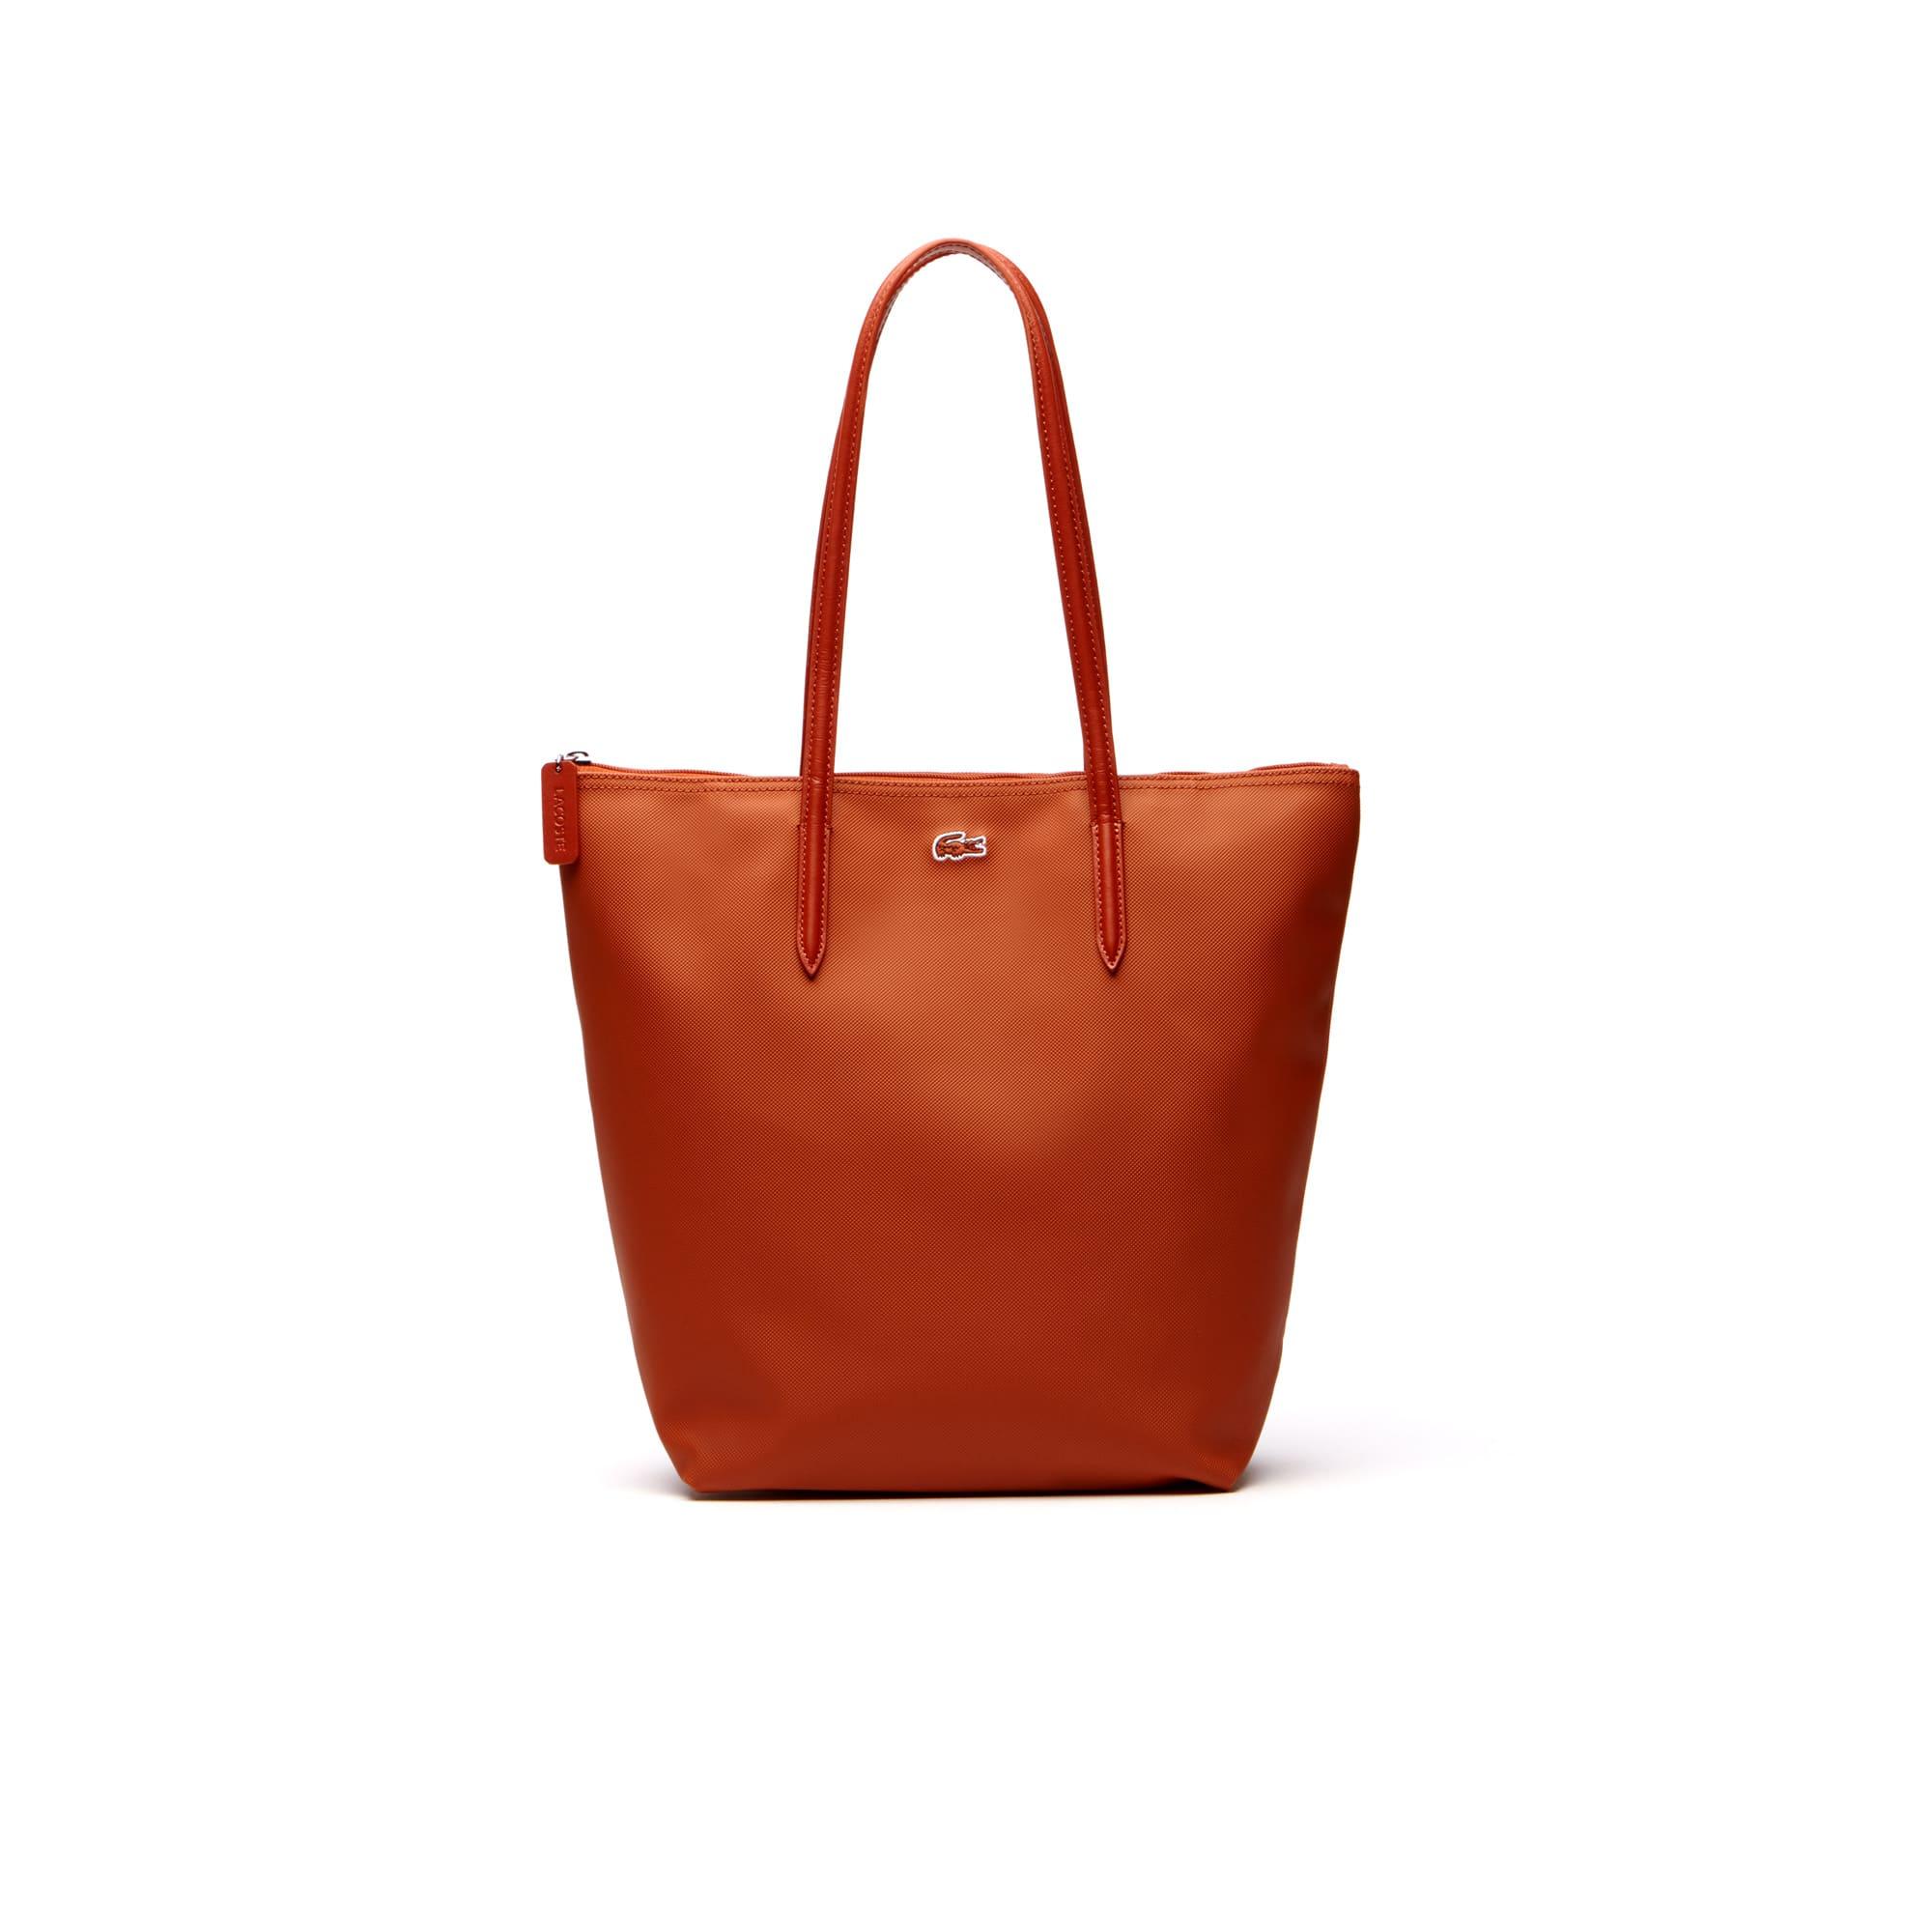 Damen L.12.12 Concept Vertikale Tote Bag mit Reißverschluss